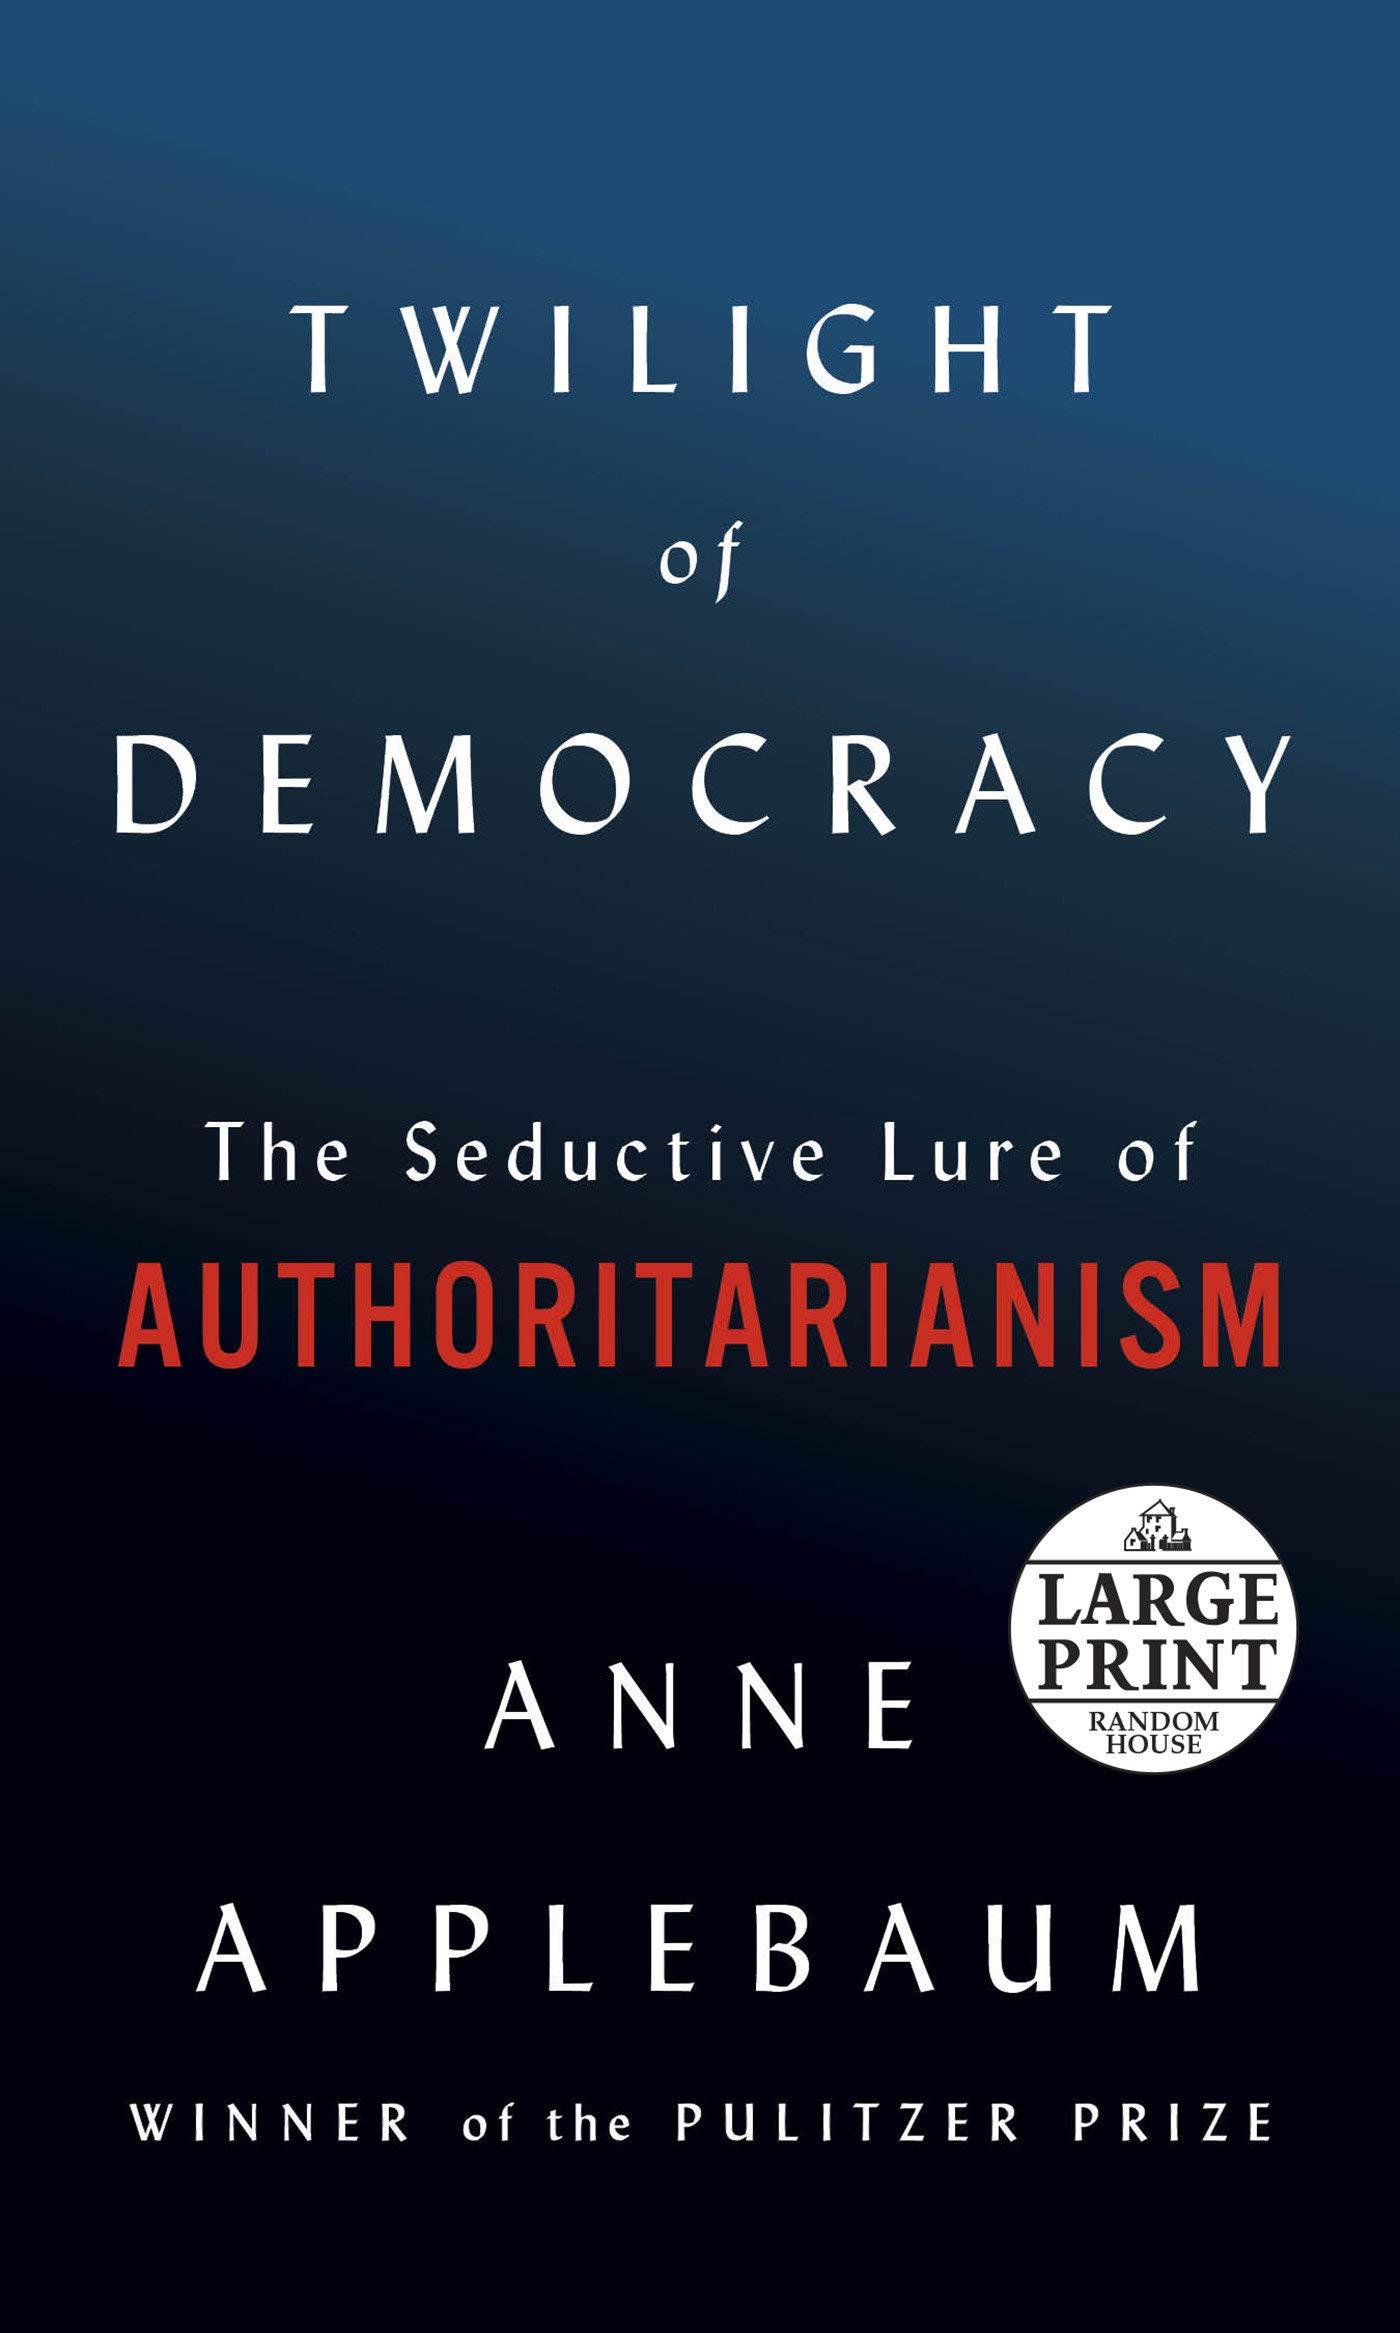 Twilight of Democracy: The Seductive Lure of Authoritarianism ...